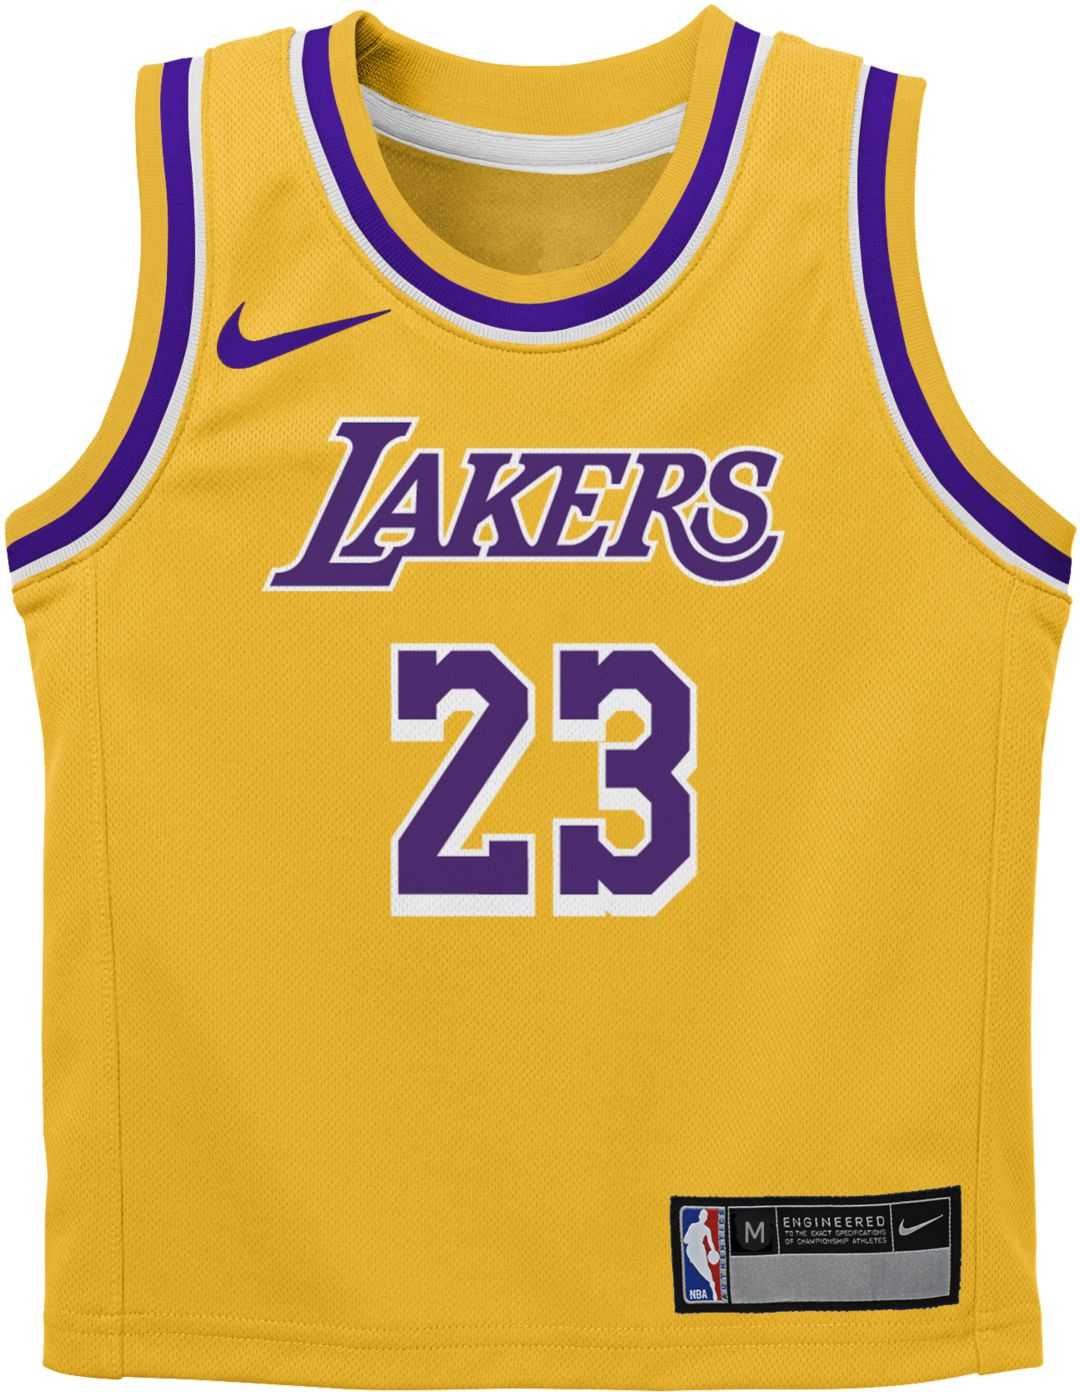 3783af67b7d Nike Toddler Los Angeles Lakers LeBron James #23 Gold Dri-FIT Swingman  Jersey 2